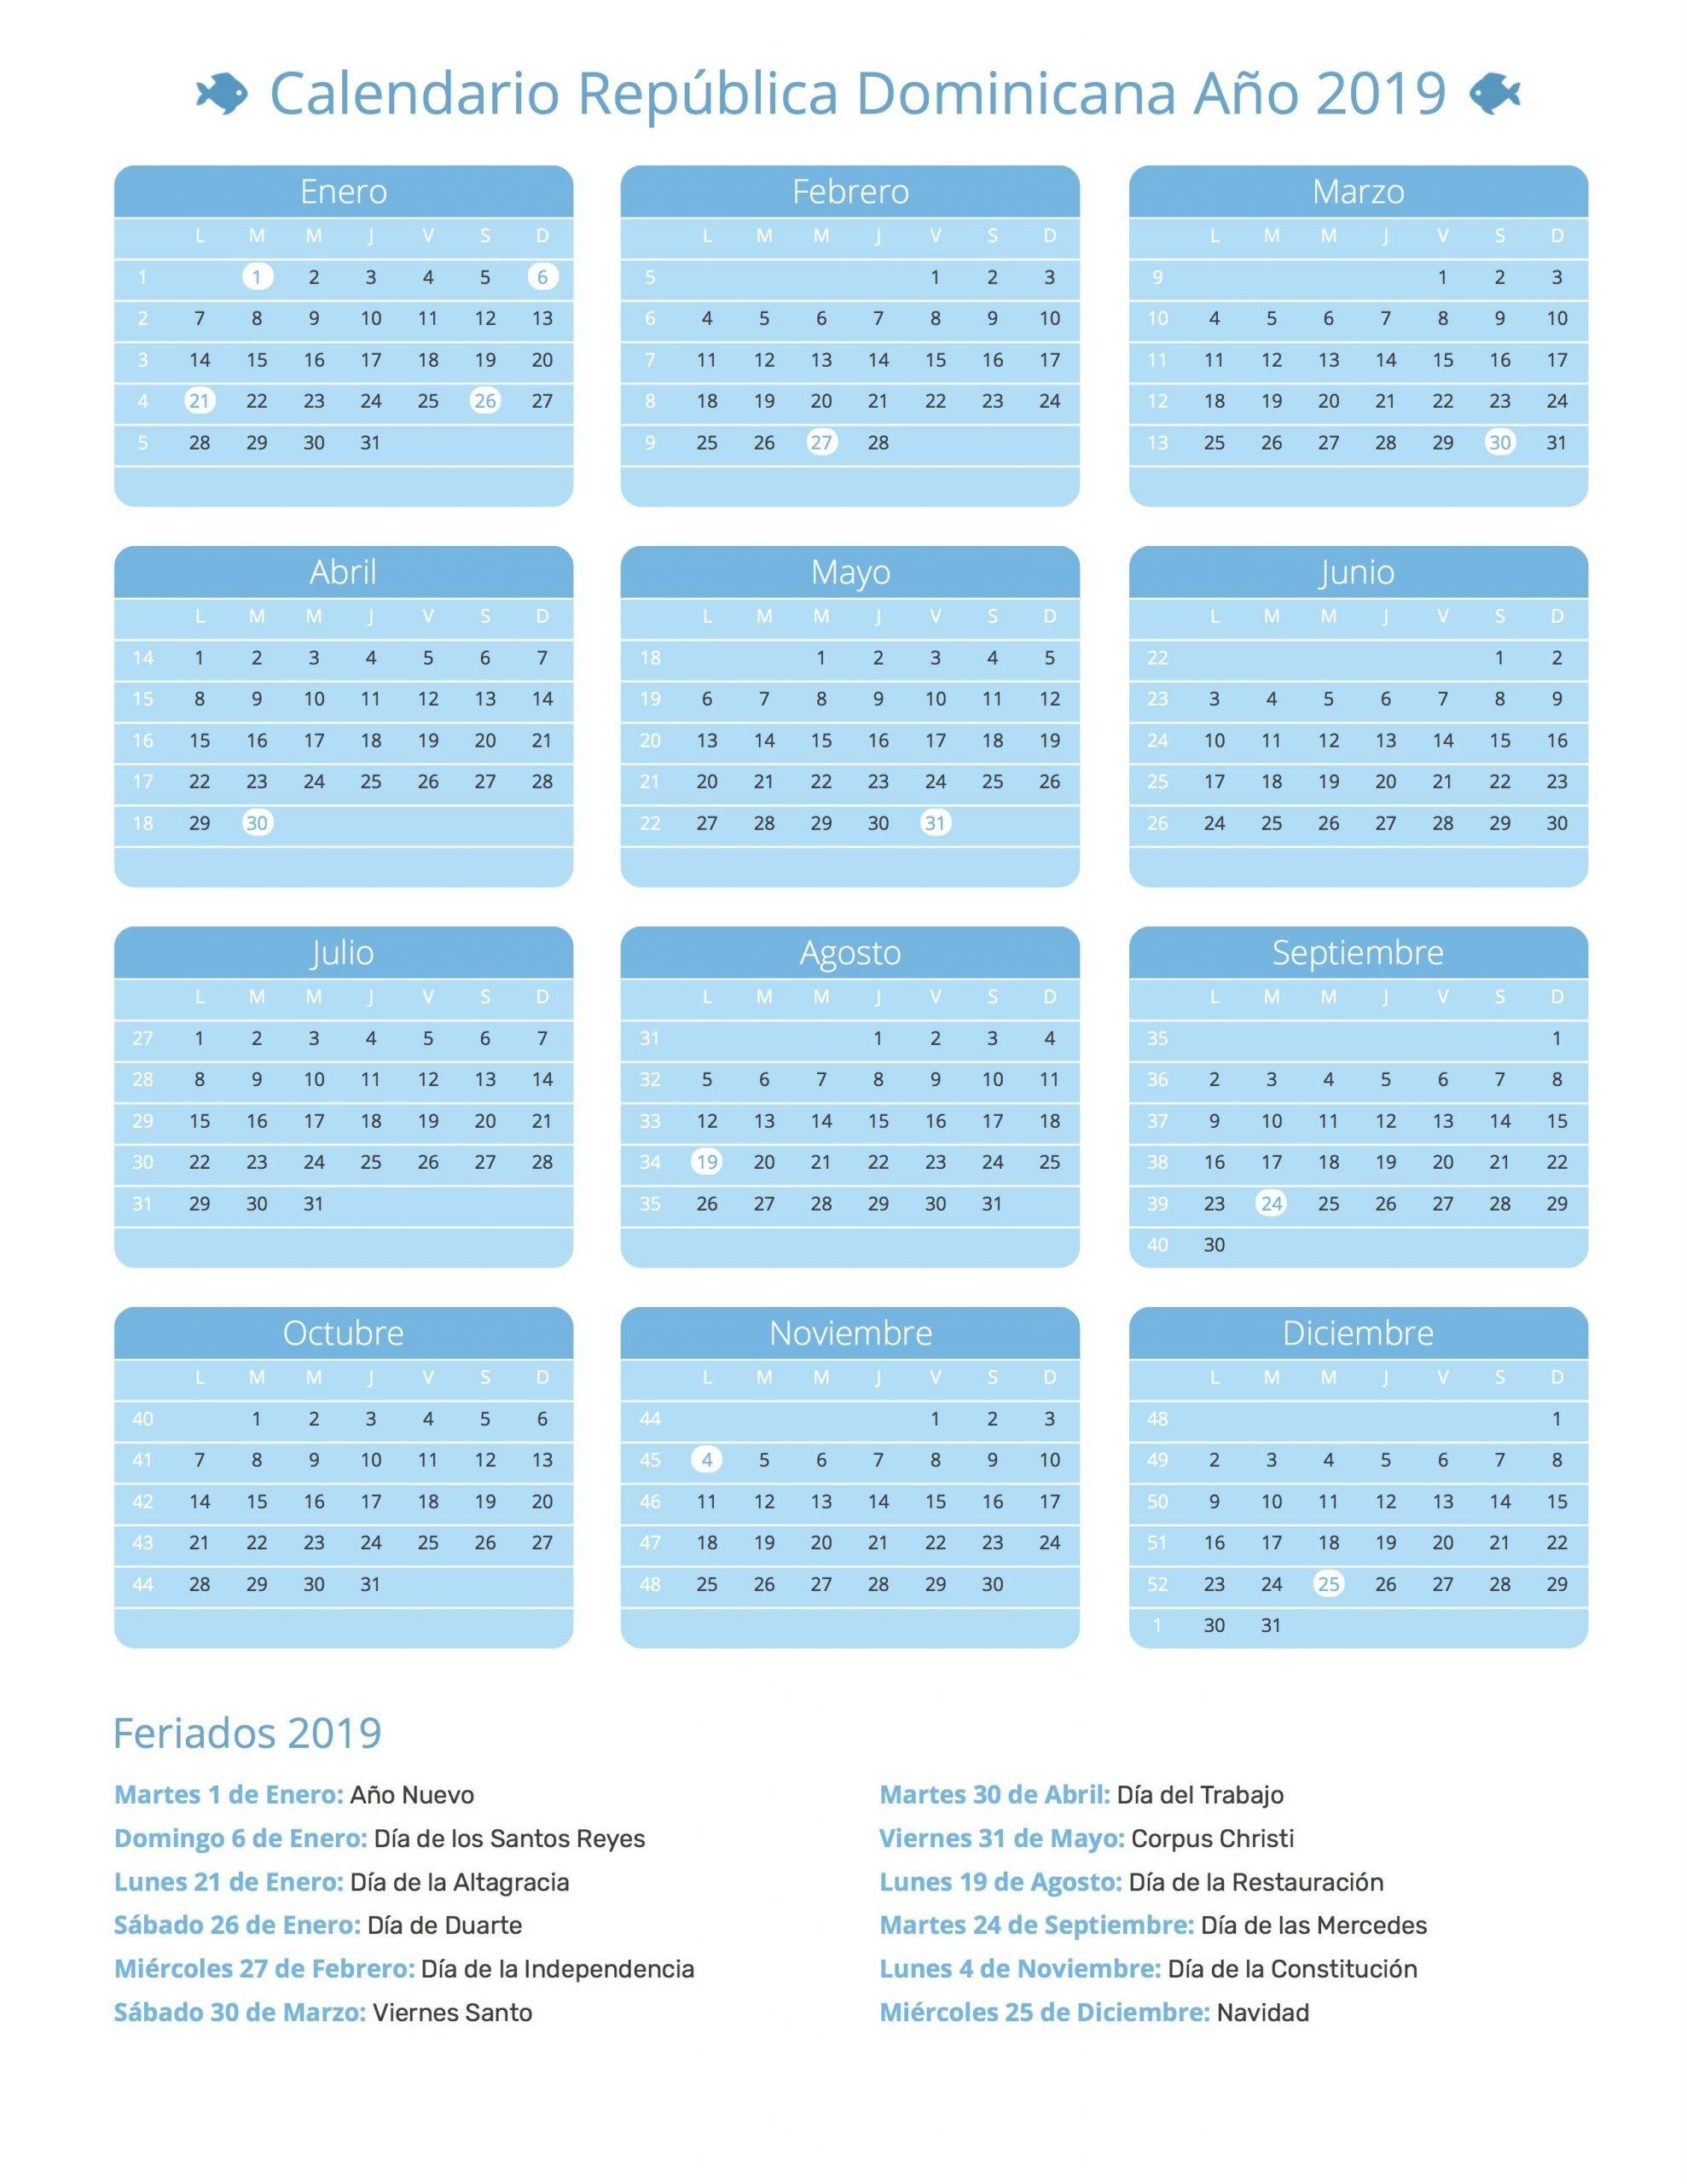 calendario 2020 bolivia con feriados para imprimir mas reciente investigar calendario anual 2019 chile para imprimir of calendario 2020 bolivia con feriados para imprimir scaled